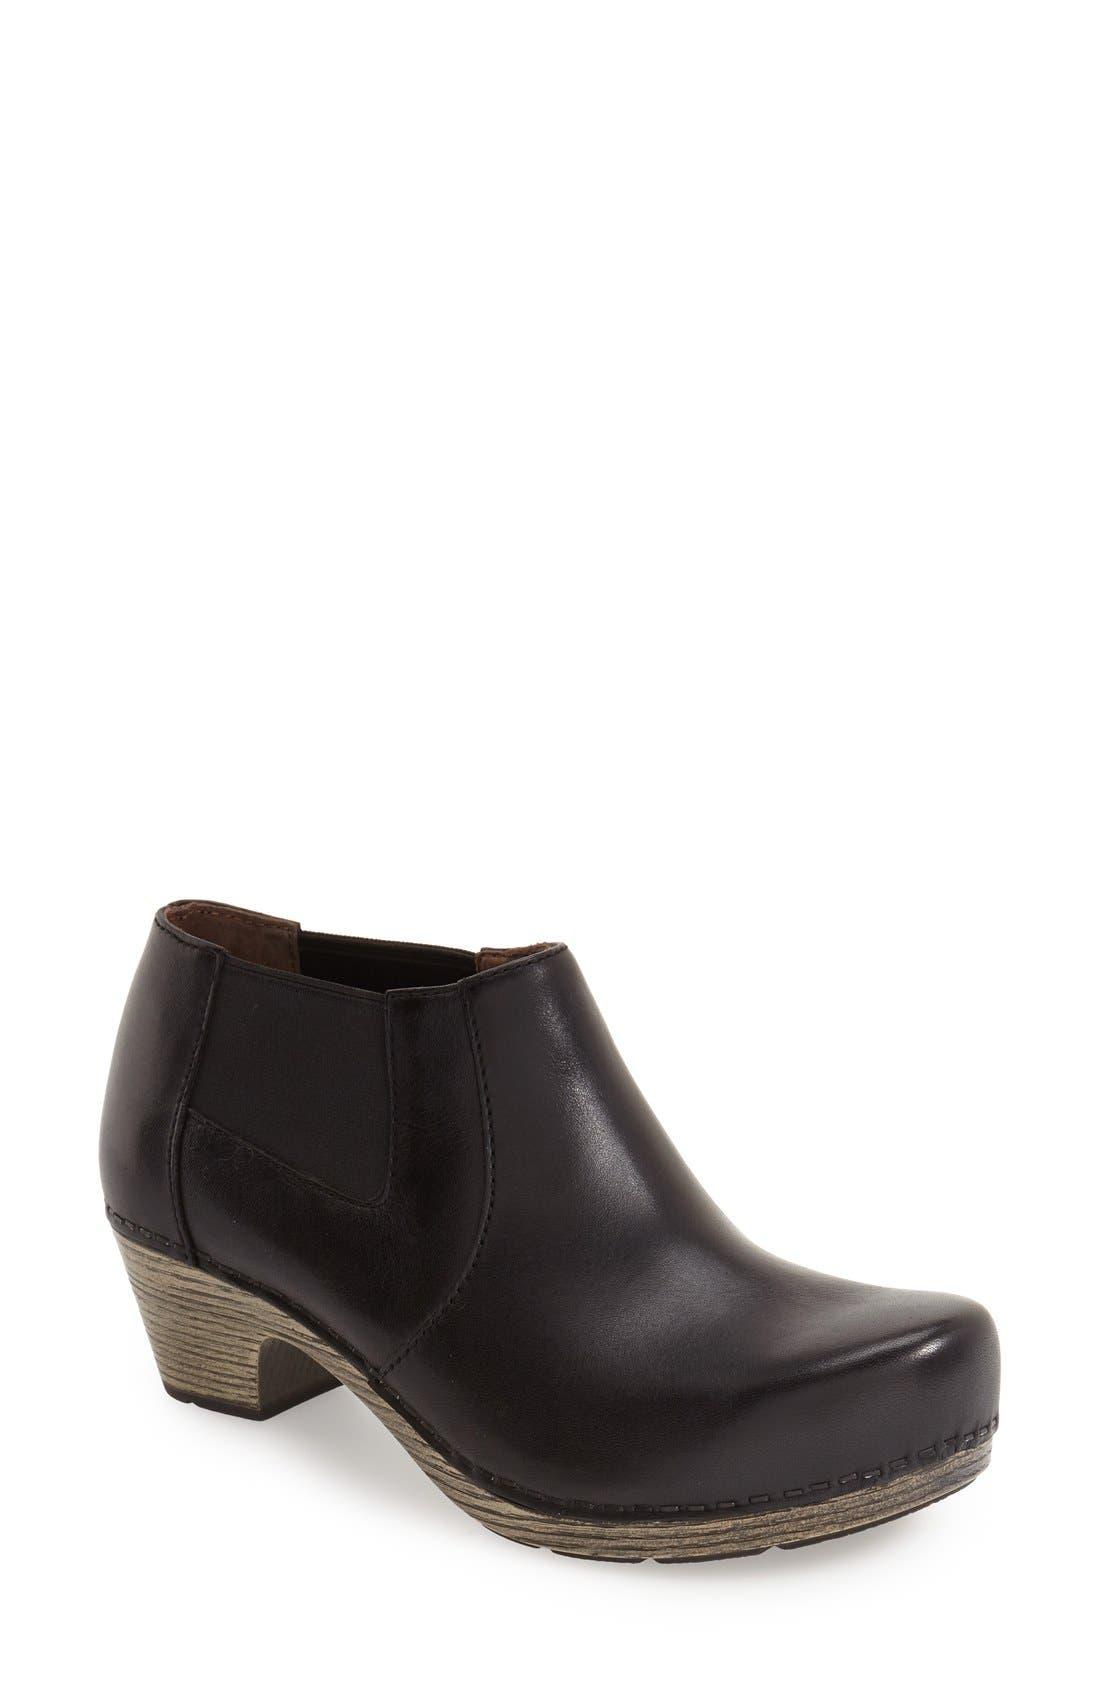 Main Image - Dansko 'Marilyn' Midi Chelsea Boot (Women)